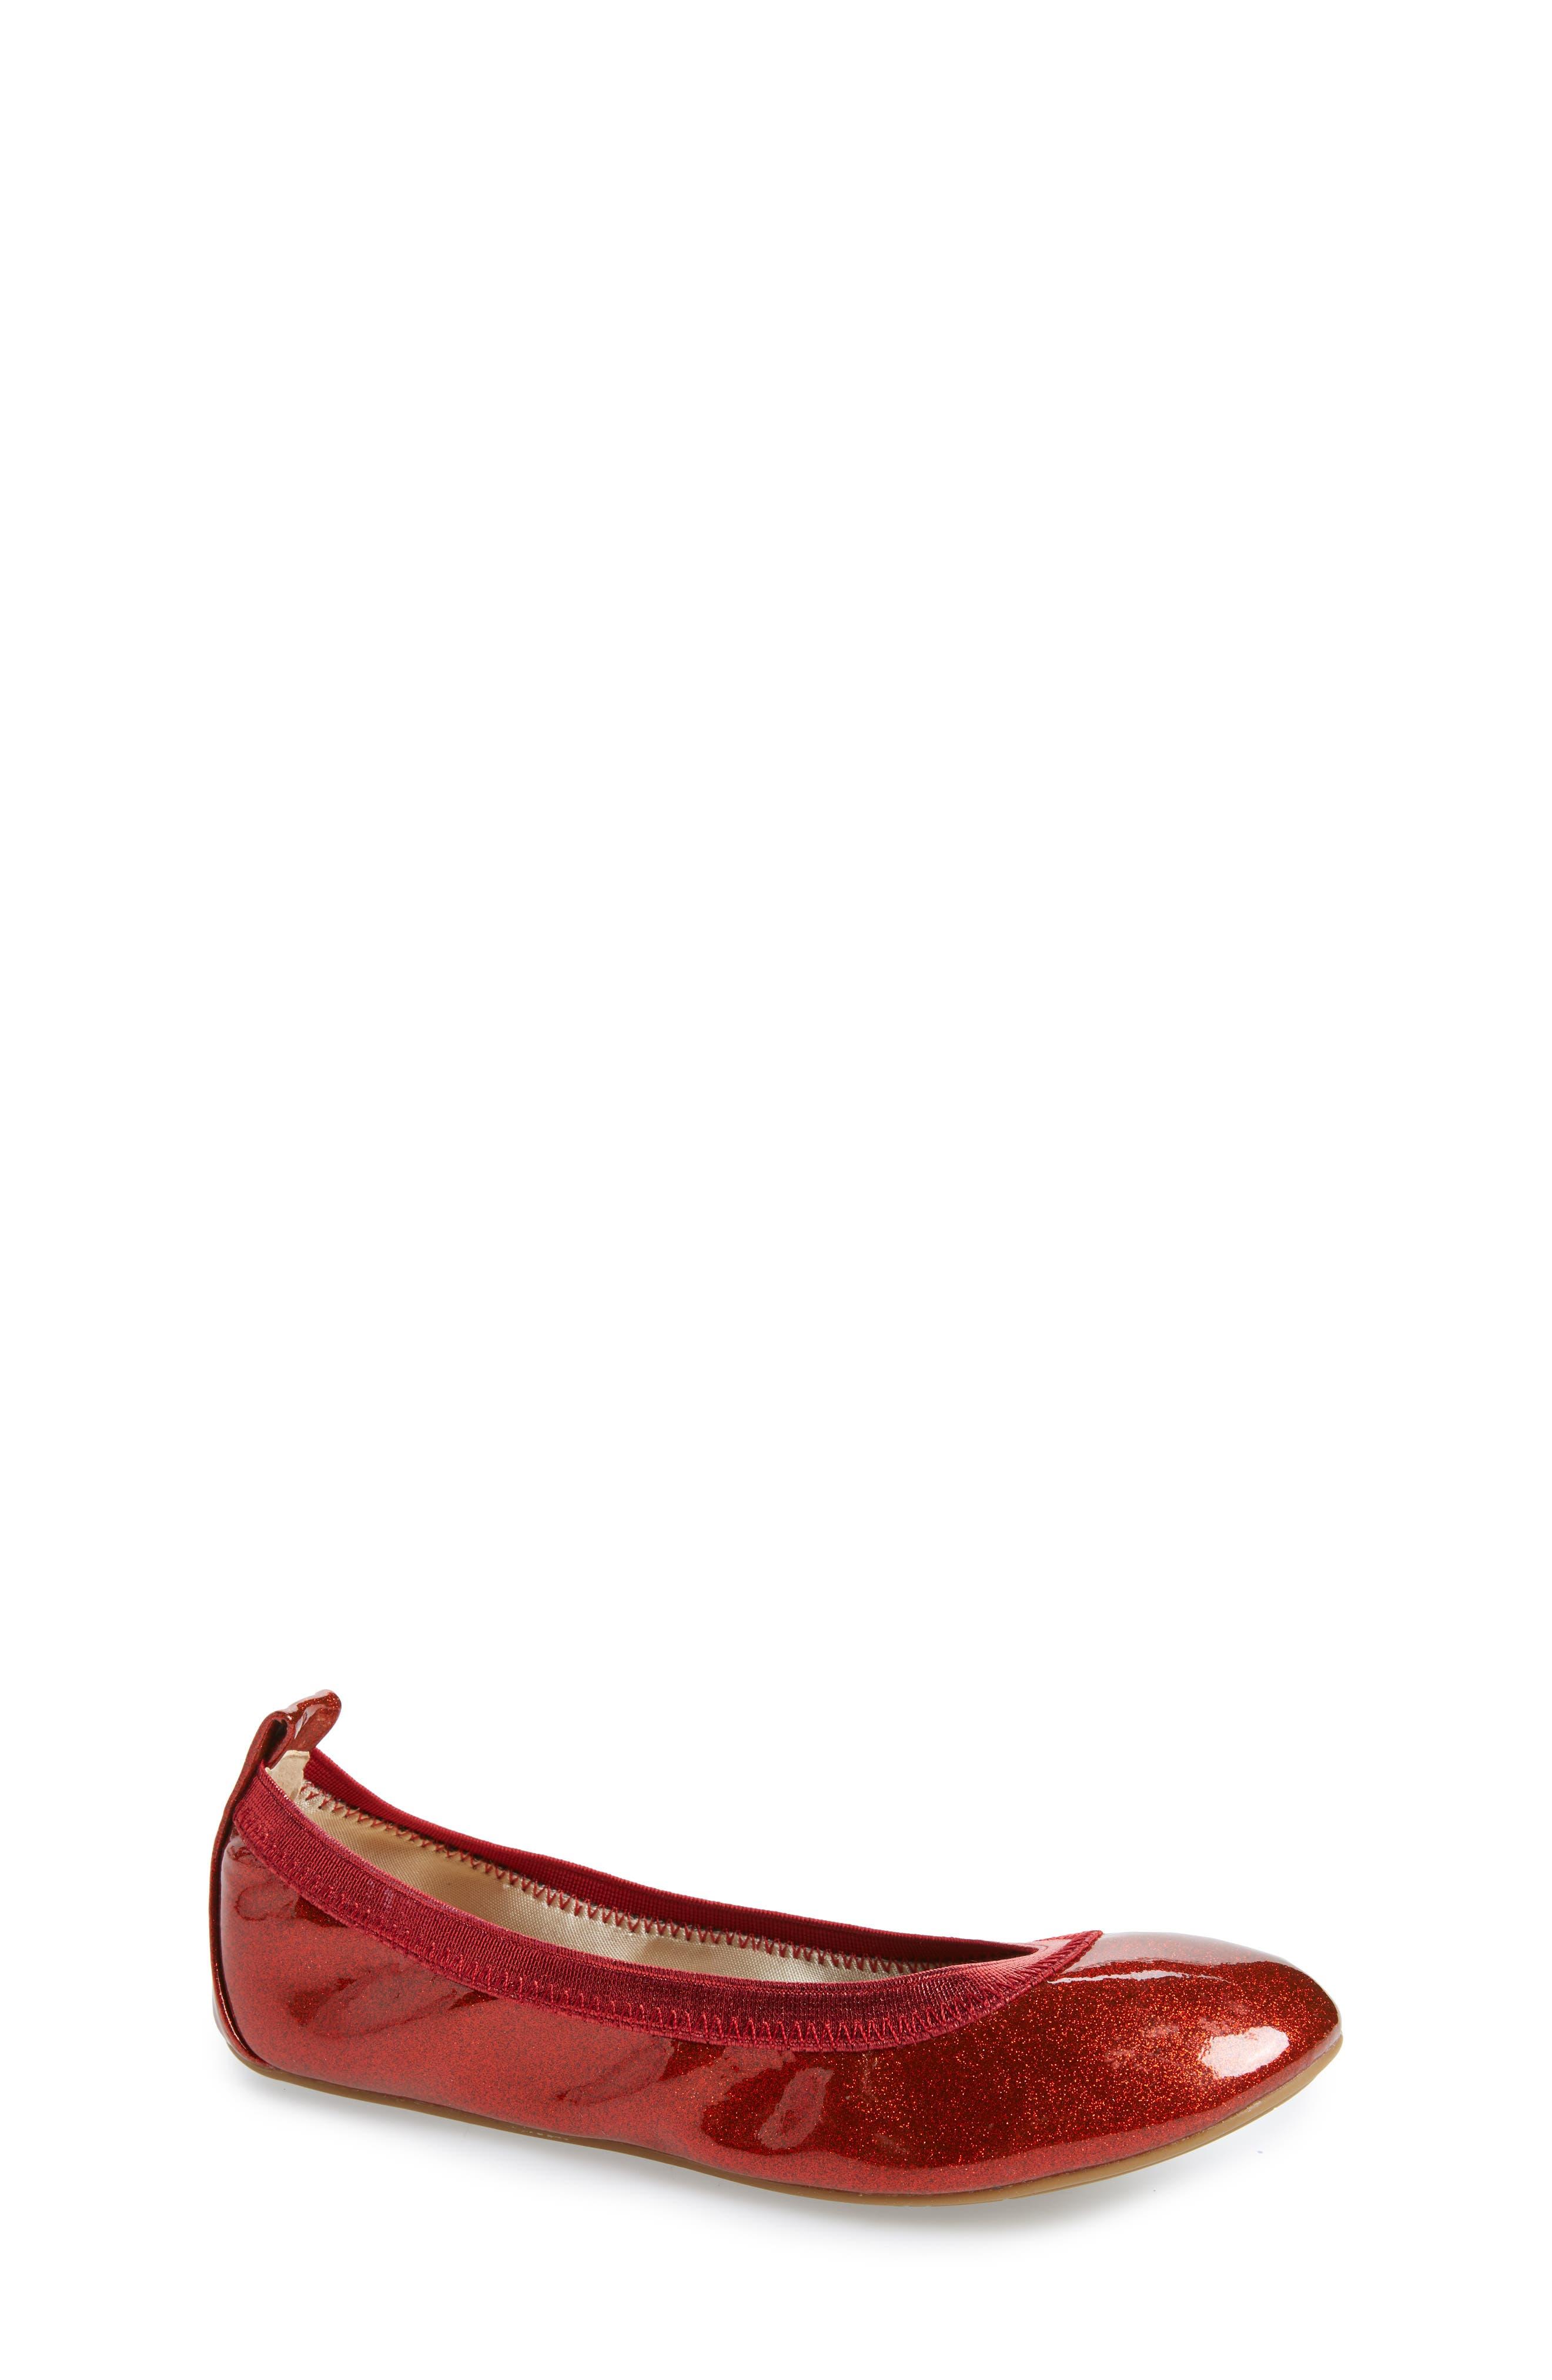 Miss Samara Ballet Flat,                         Main,                         color, RED PATENT GLITTER